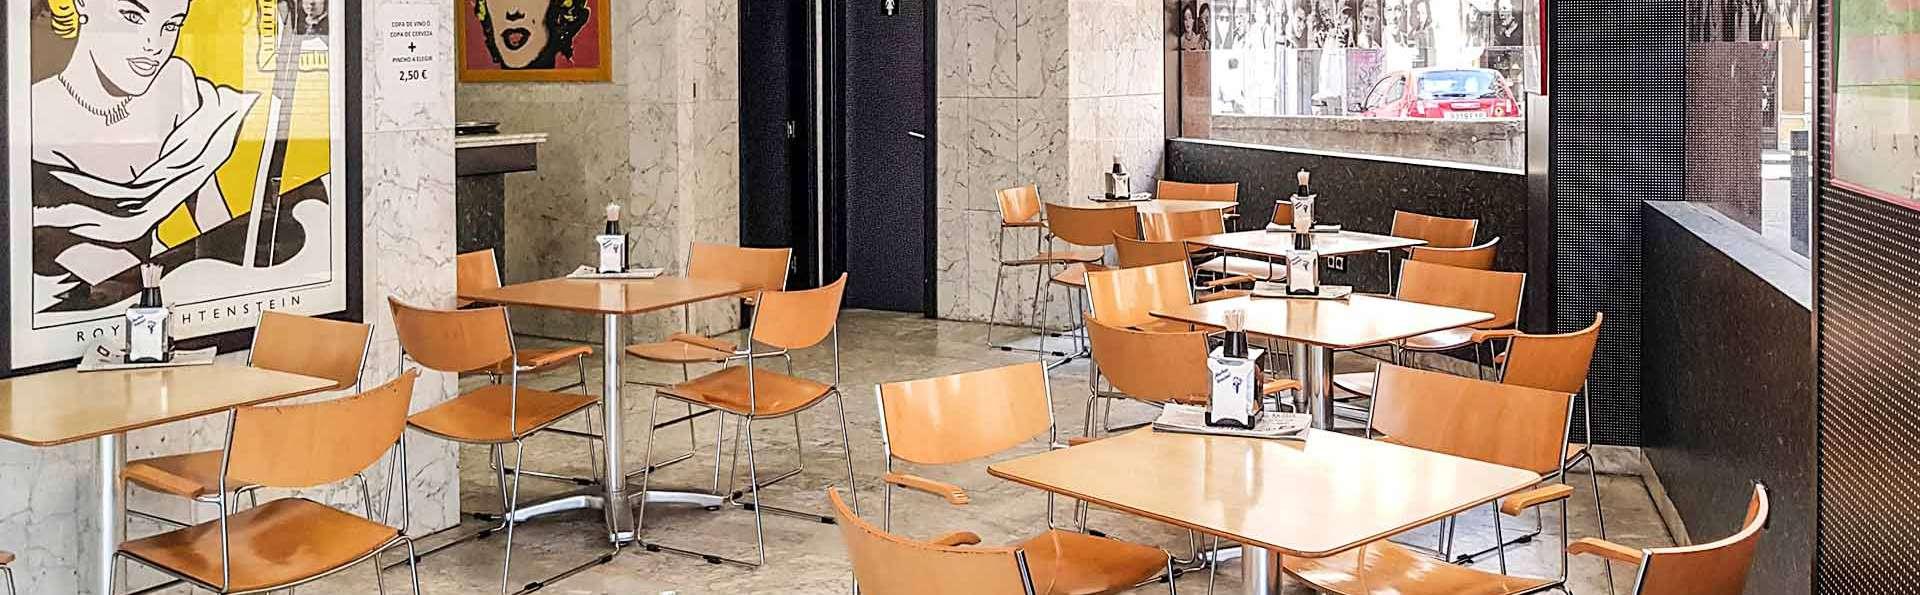 Hotel City House Pathos - EDIT_Cafeteria_01.jpg